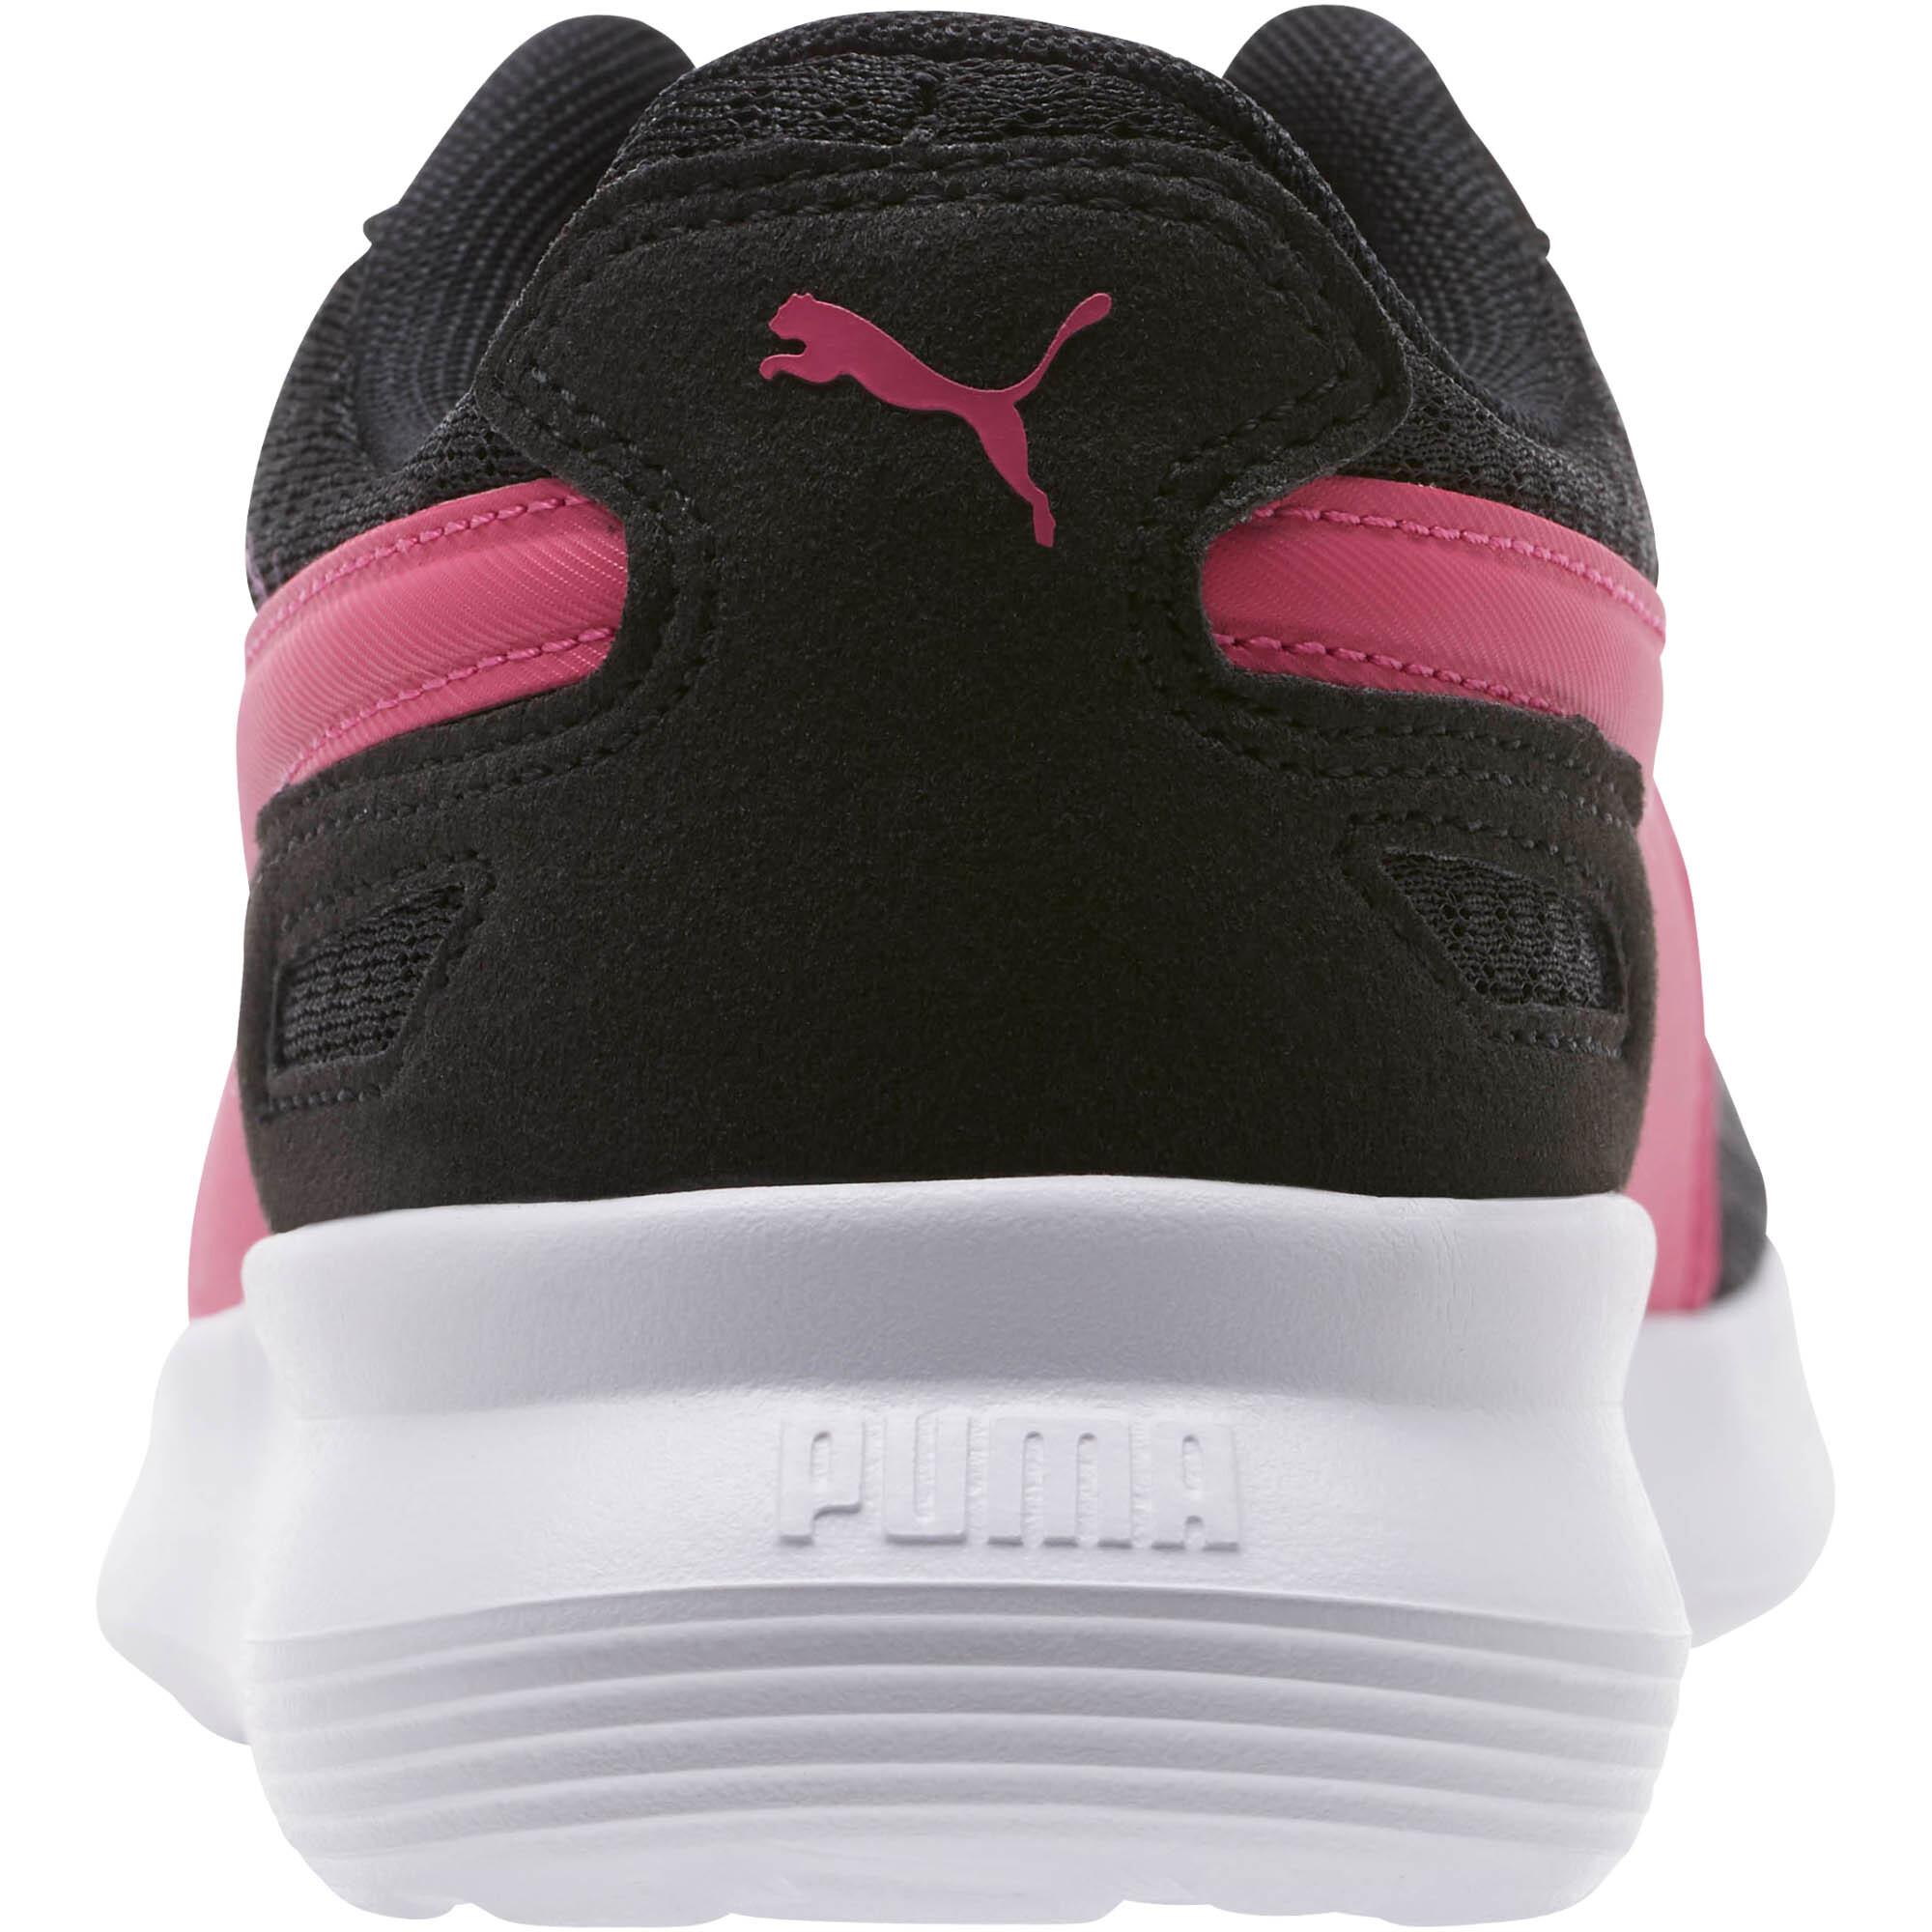 PUMA-ST-Activate-Women-s-Sneakers-Women-Shoe-Basics thumbnail 8